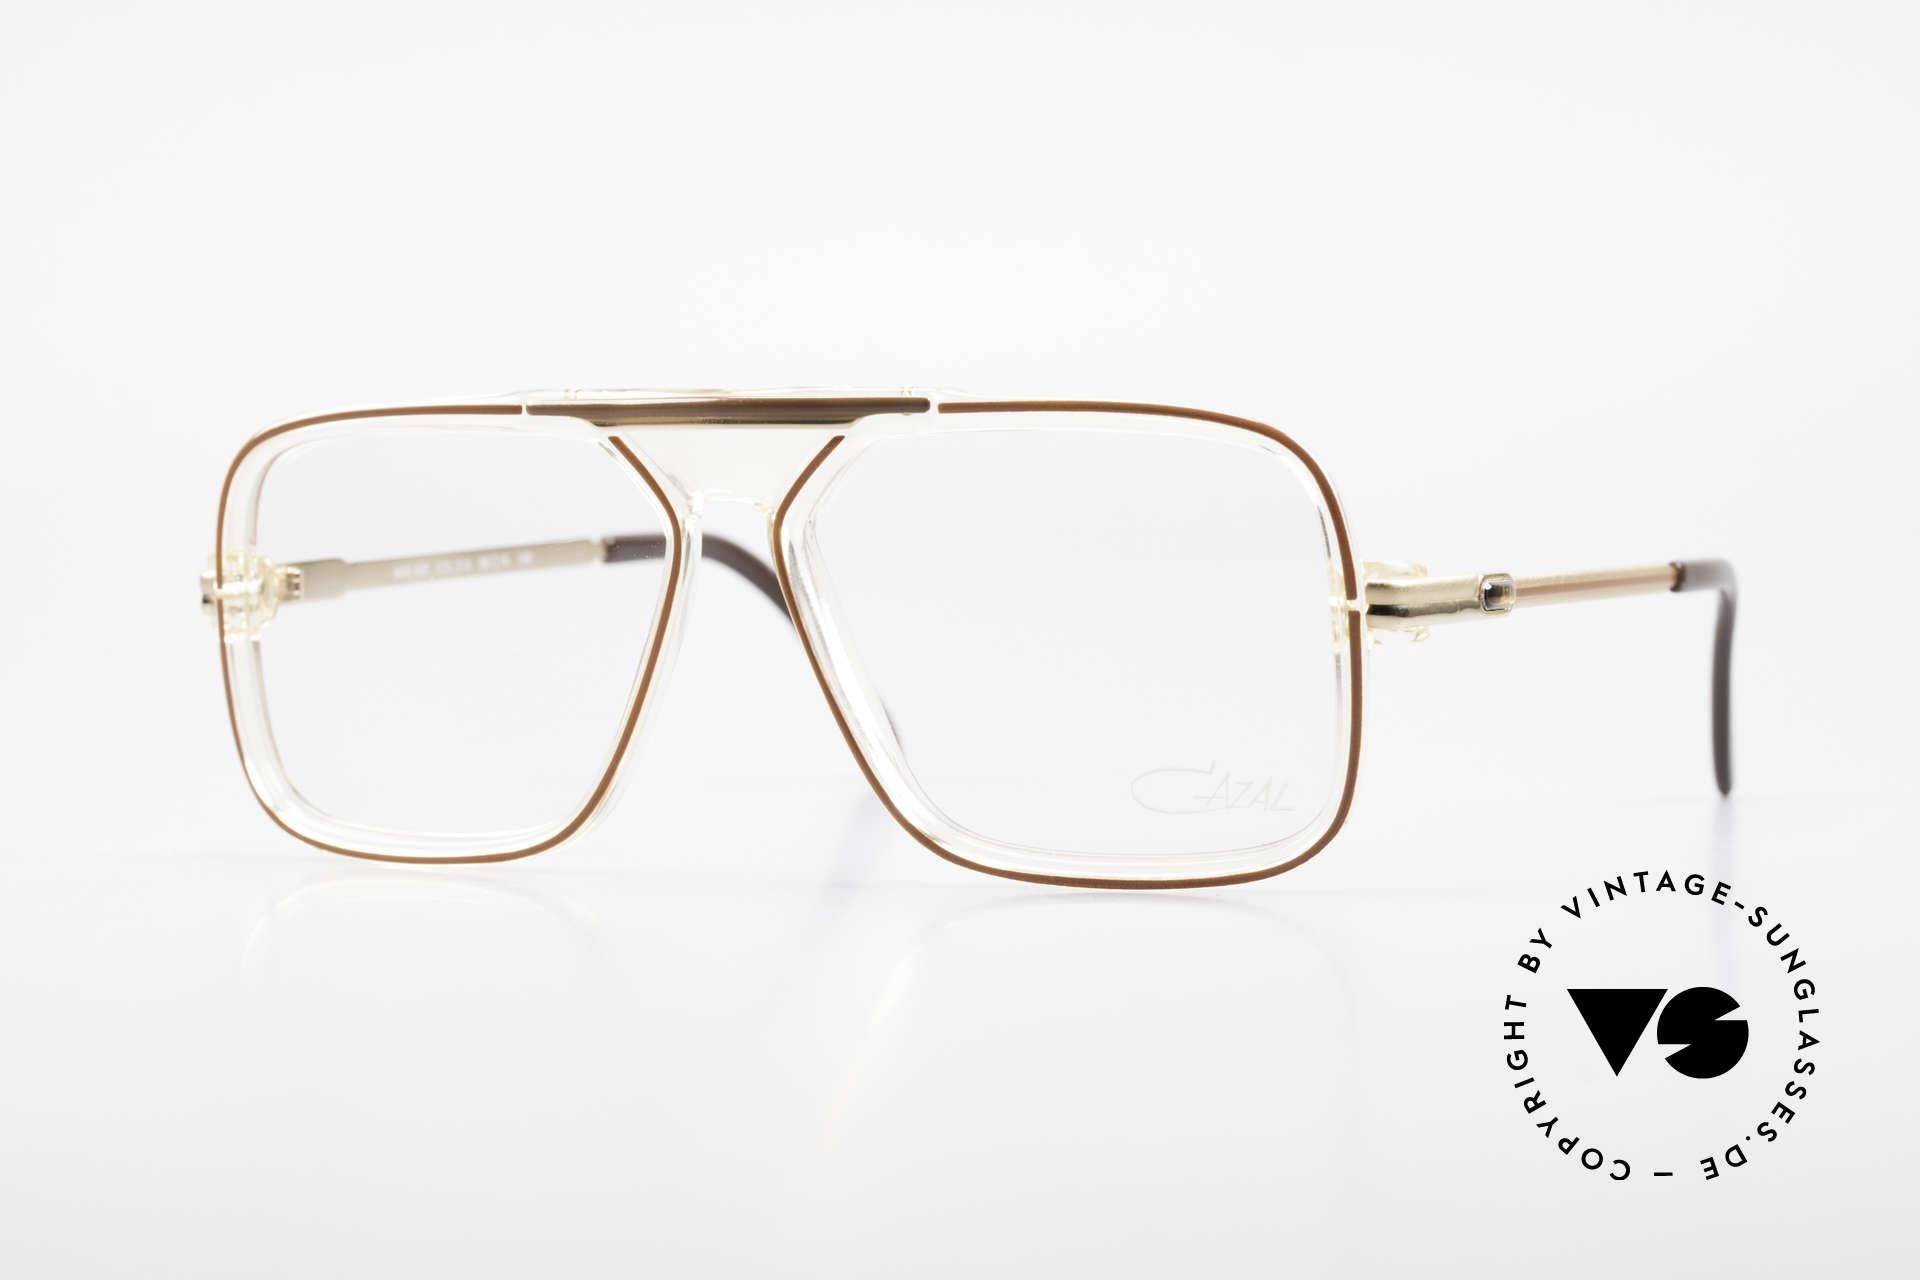 Cazal 630 Old 80's Hip Hop Cazal Glasses, legendary Cazal HipHop old school glasses, Made for Men